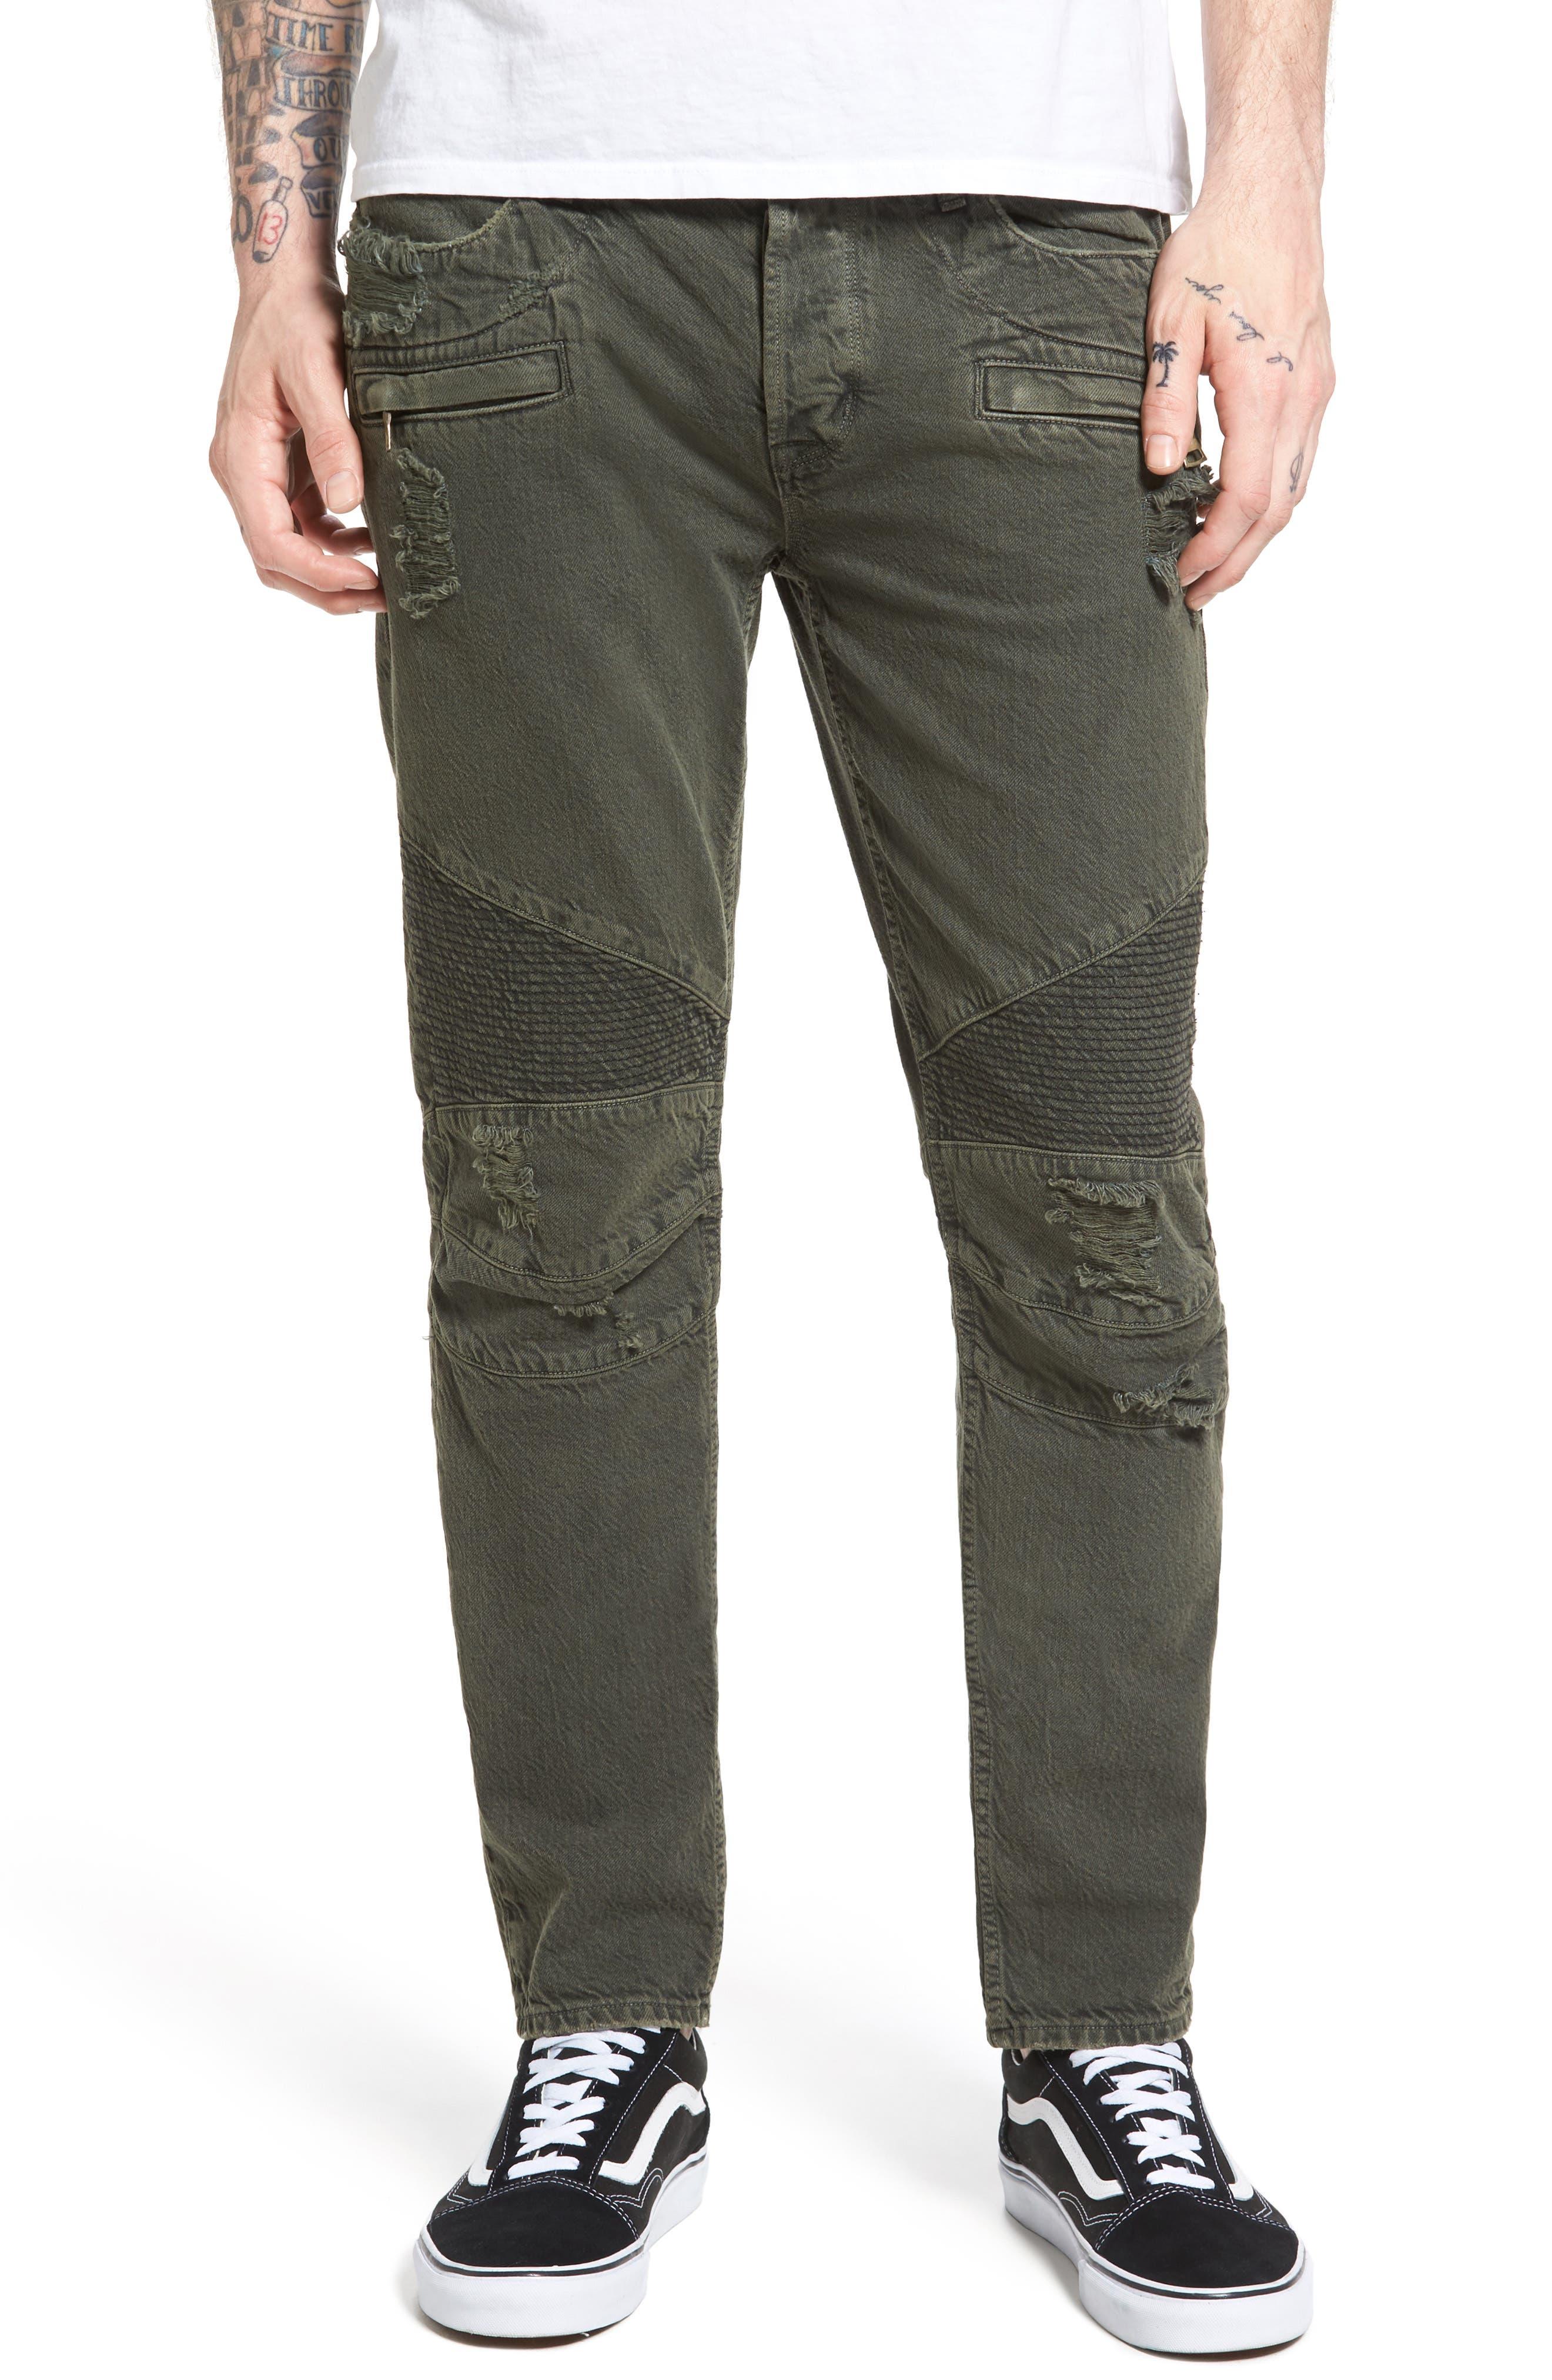 Blinder Biker Skinny Fit Jeans,                             Main thumbnail 1, color,                             Fortitude Green